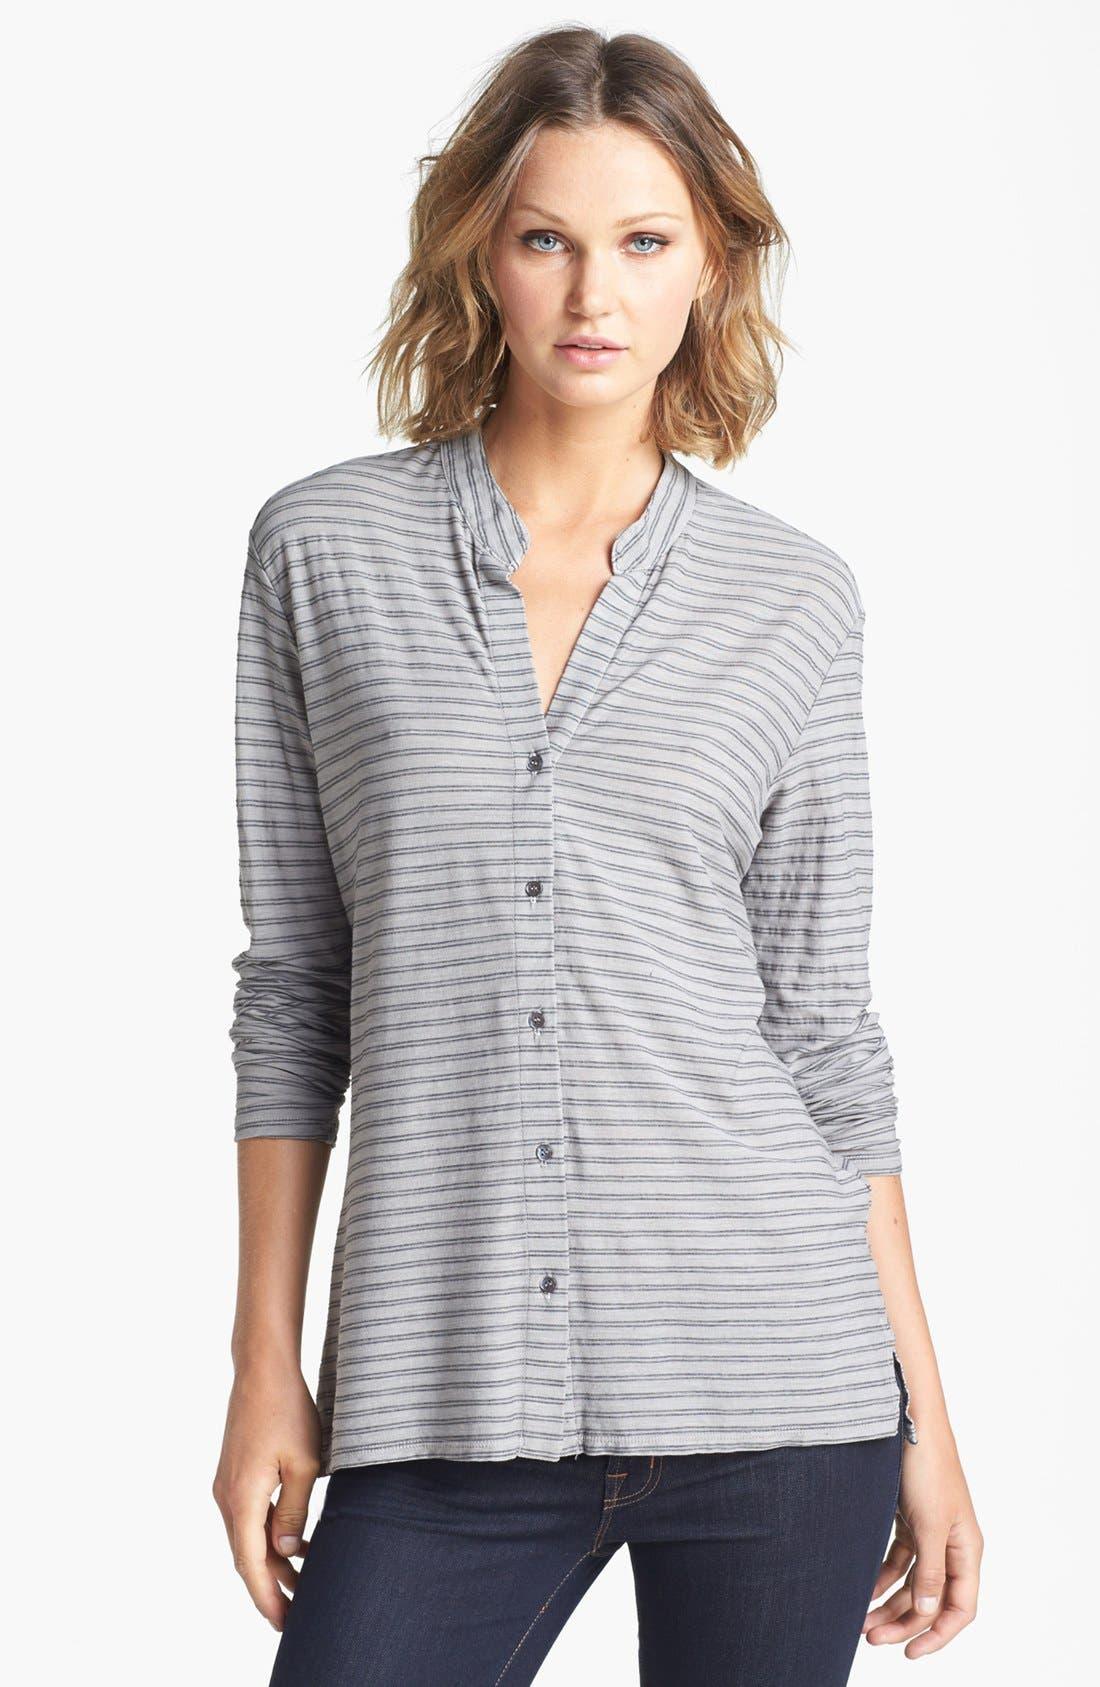 Main Image - James Perse Stripe Slub Jersey Button Up